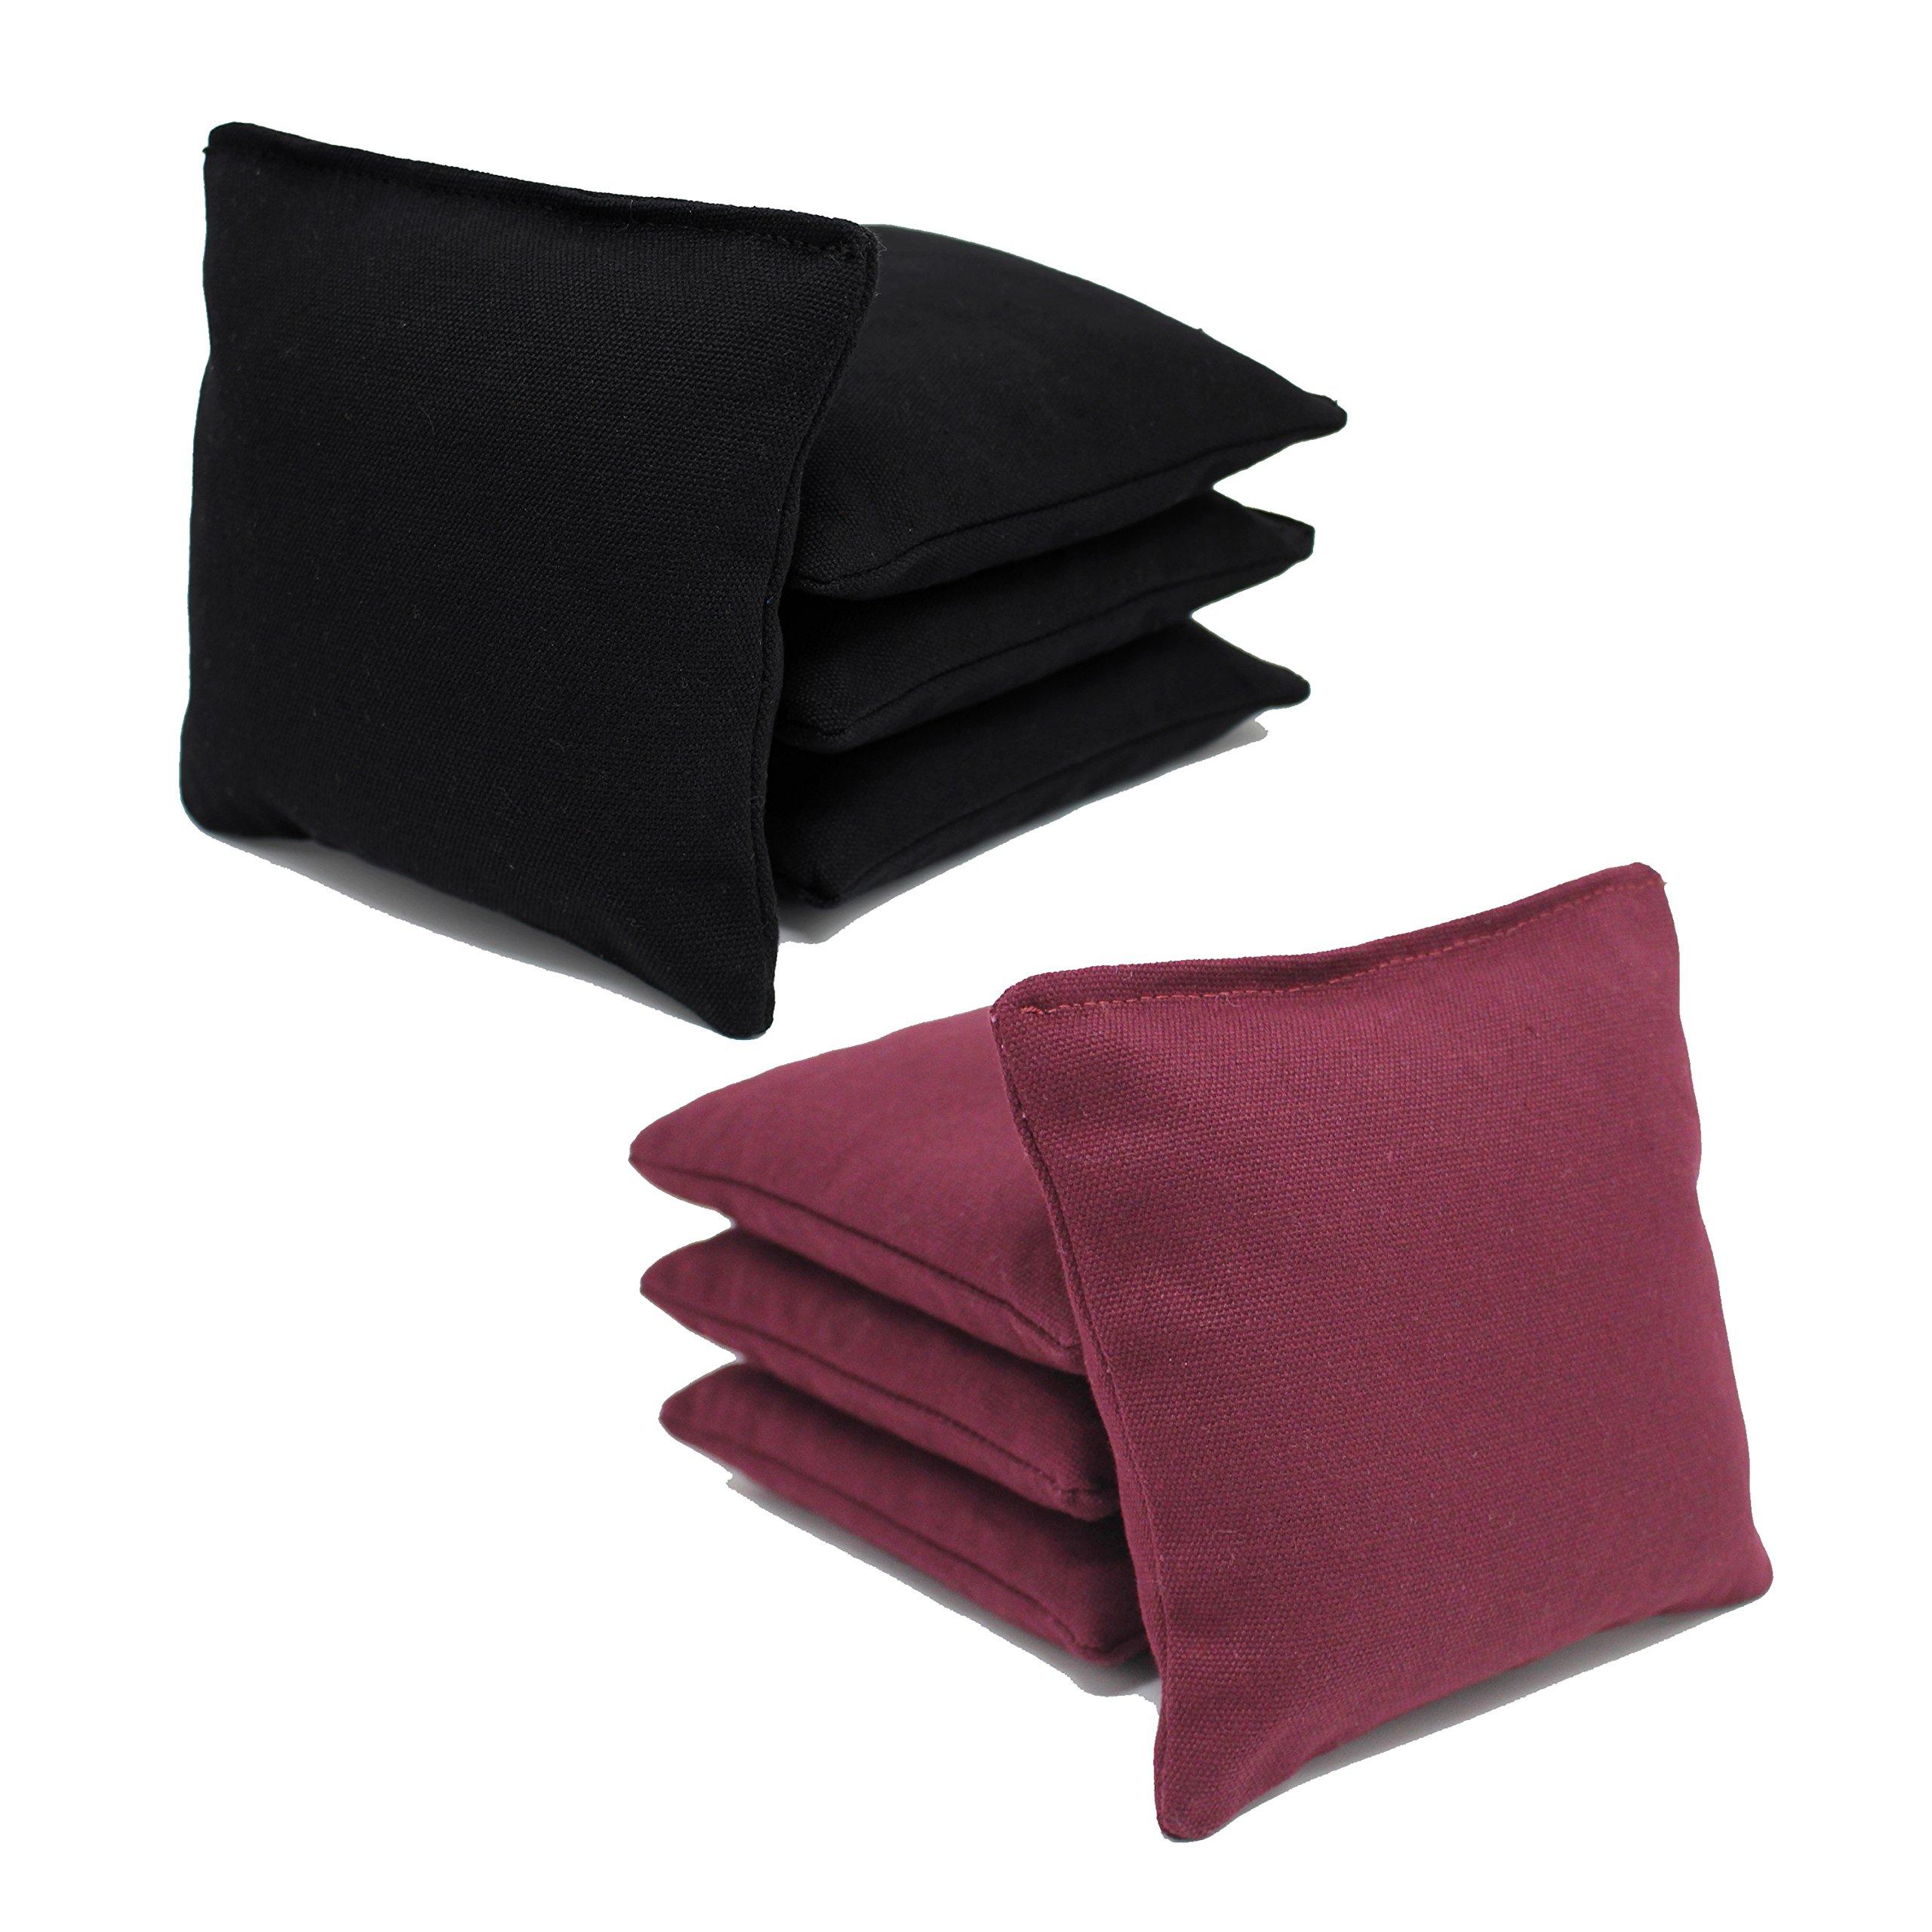 Free Donkey Sports Cornhole Bags (Pack of 8), Black/Burgundy, Regular